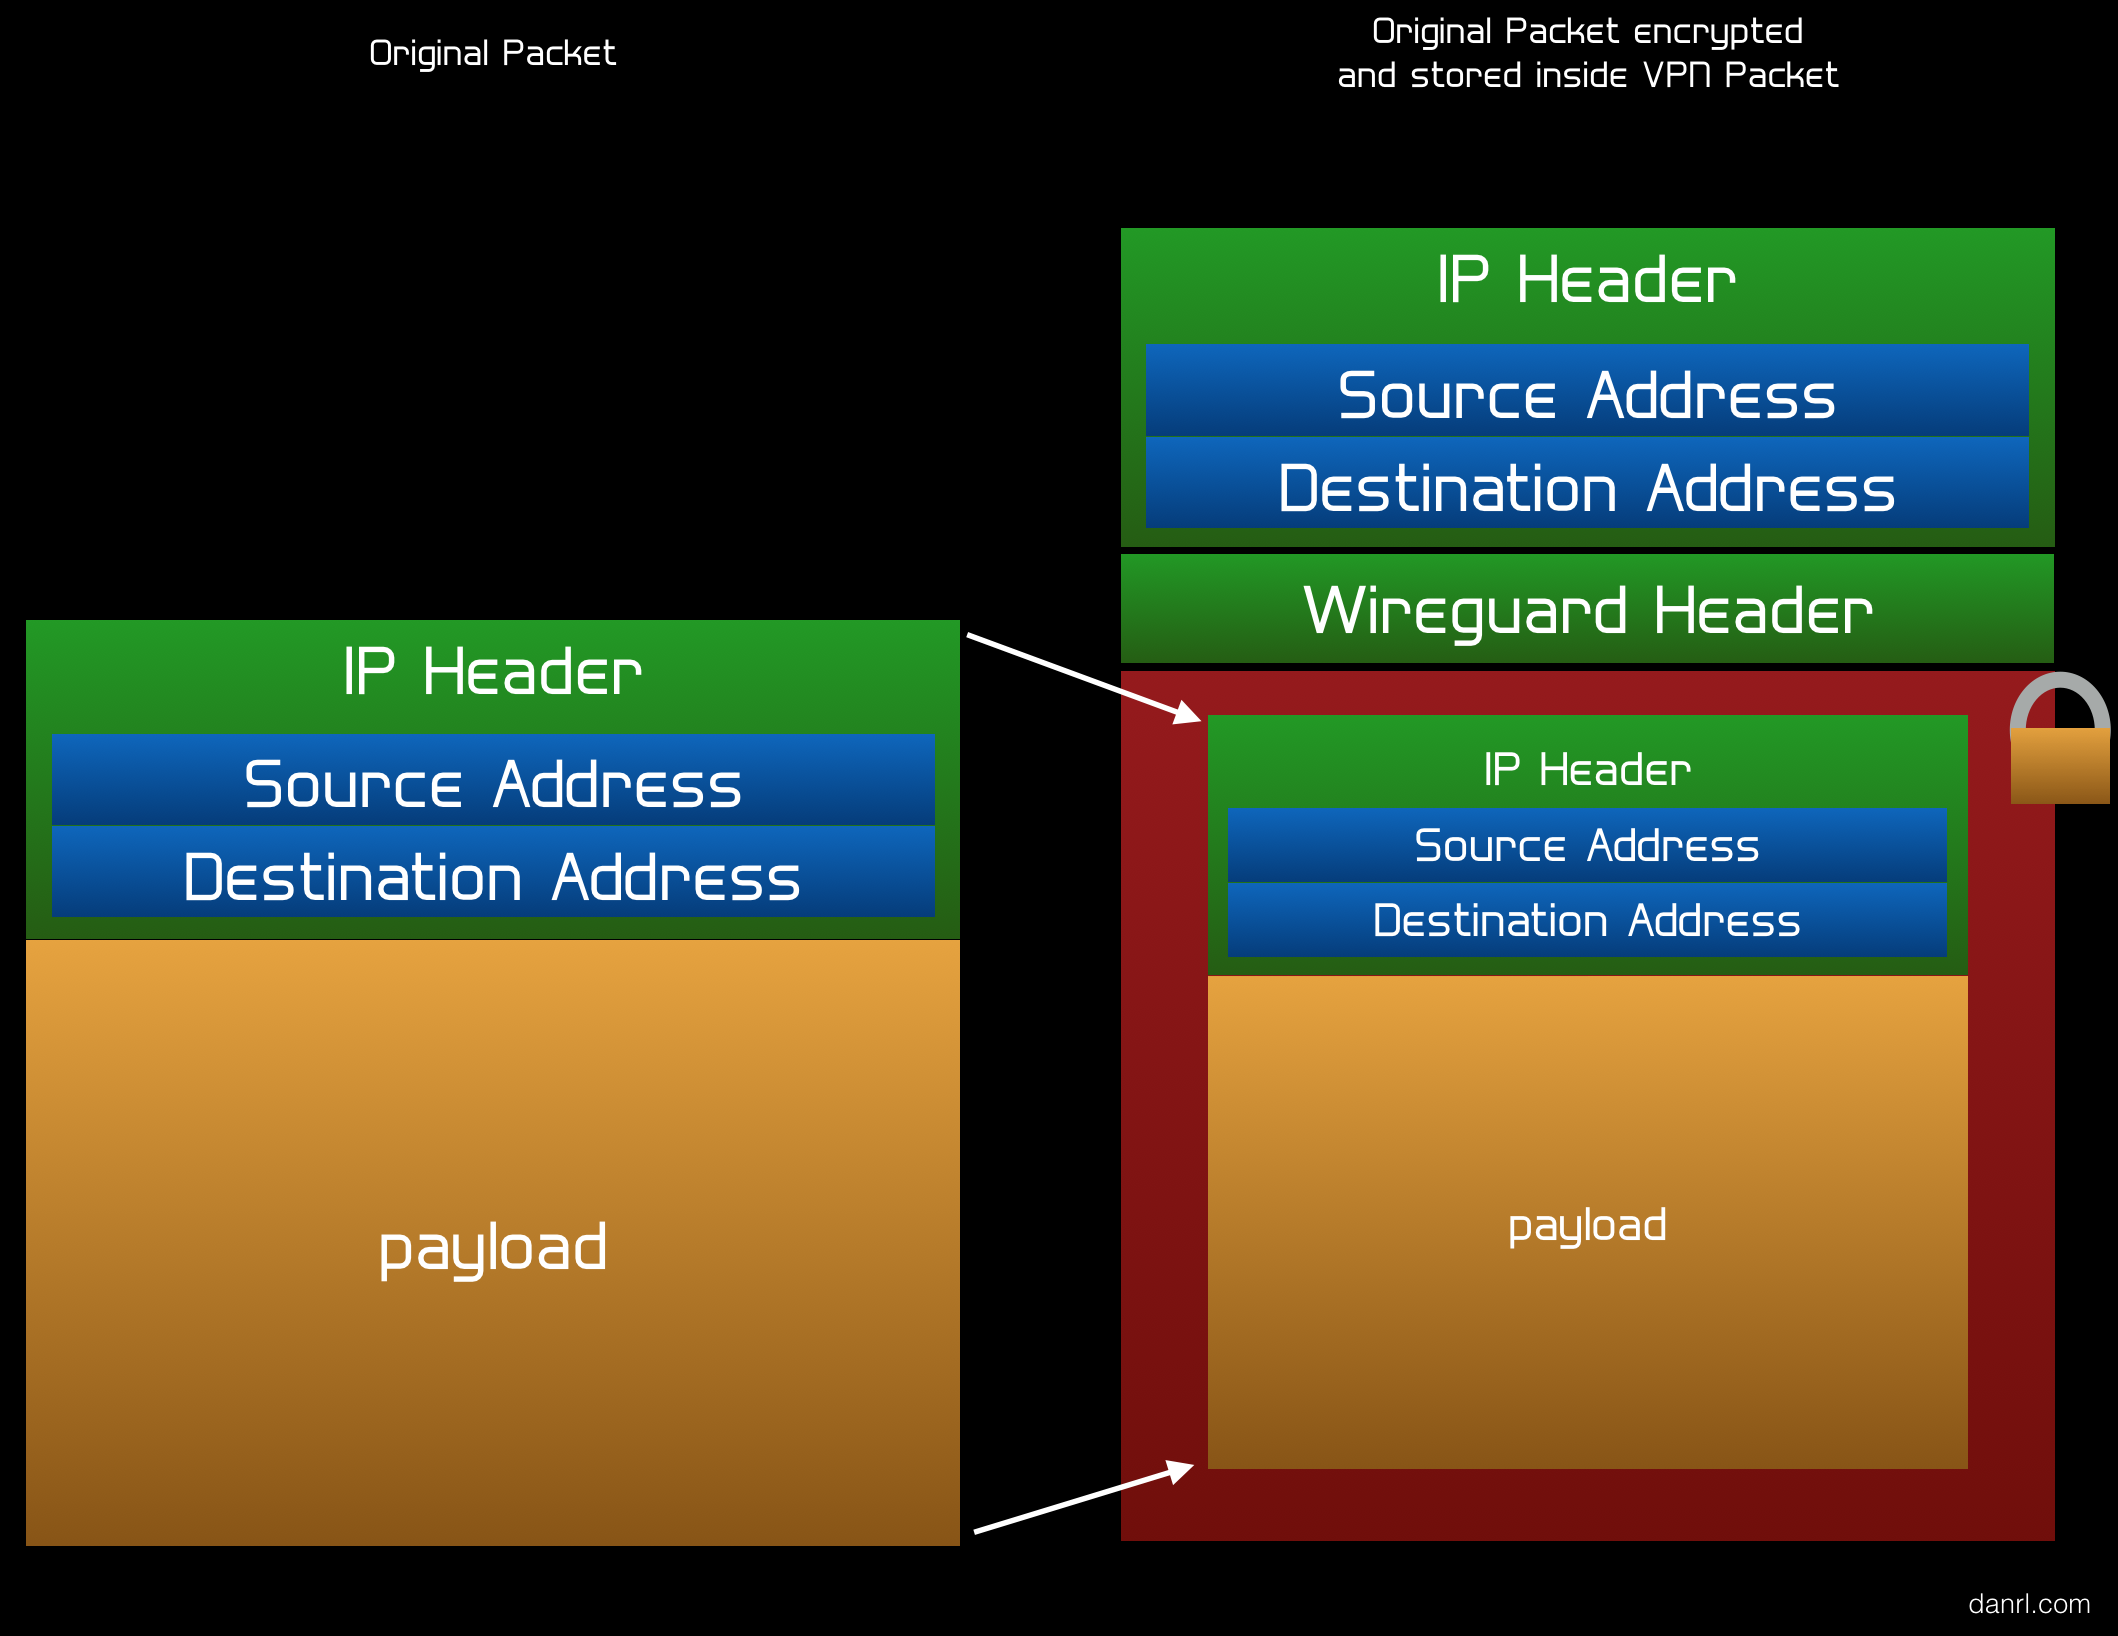 VPN Packet